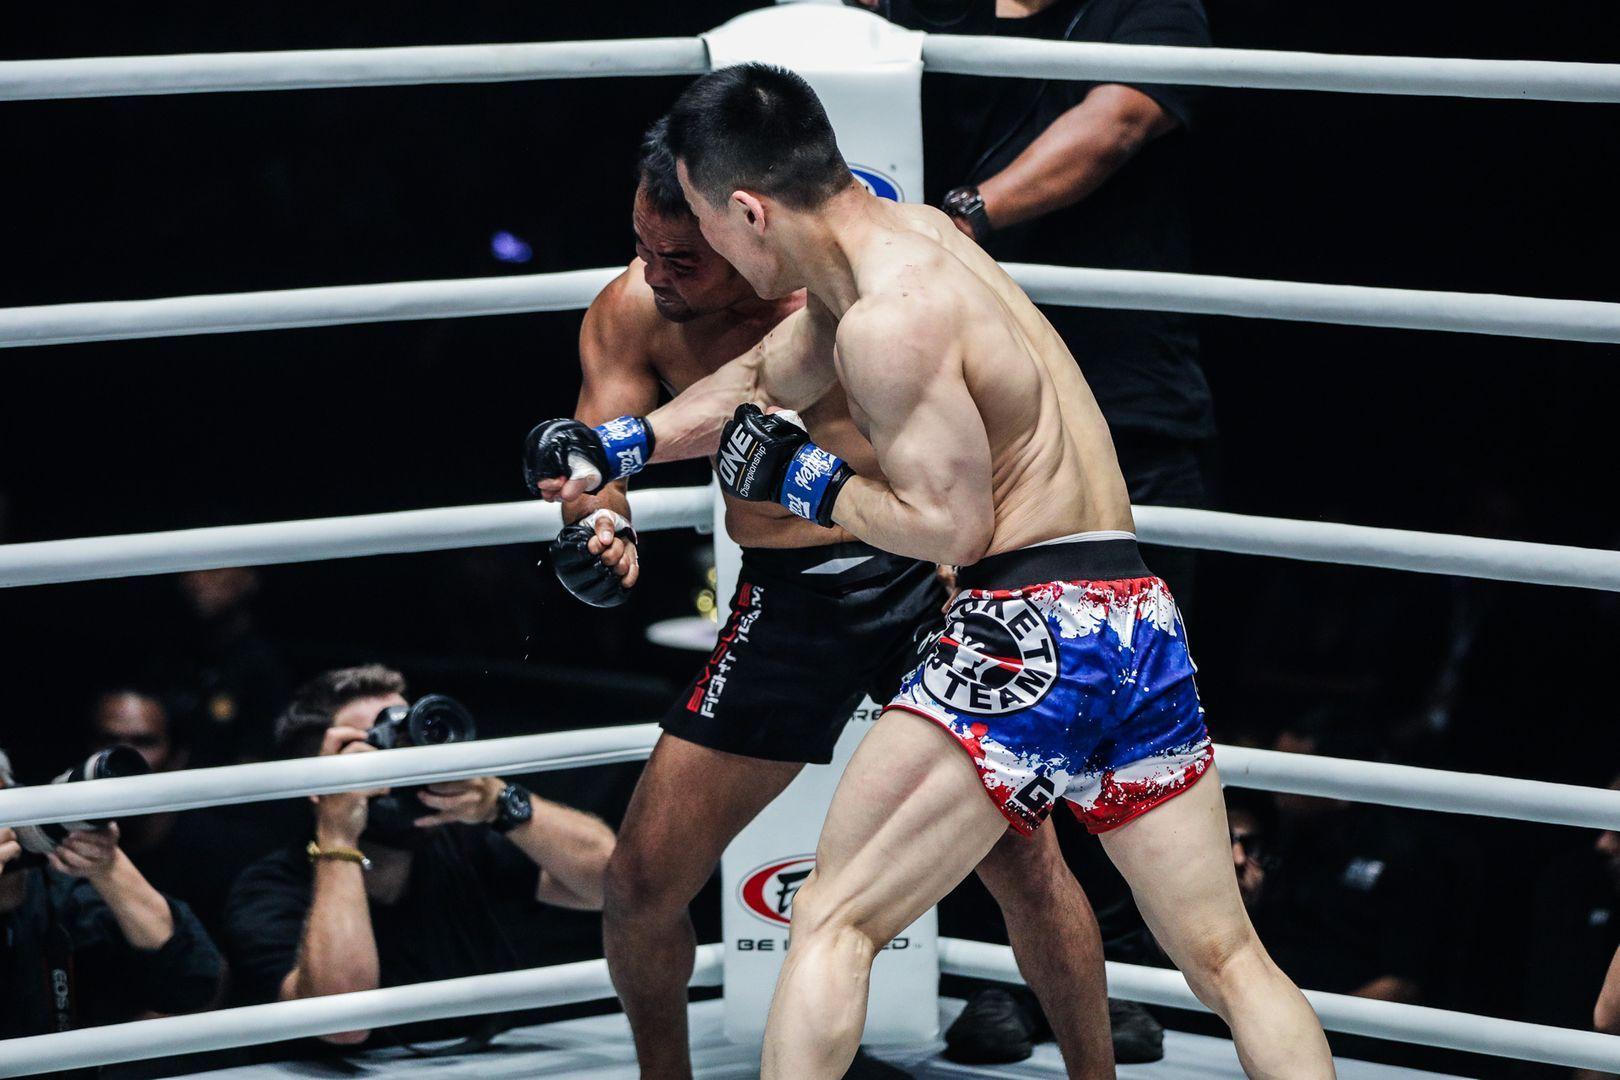 Miao Li Tao knocks out Dejdamrong Sor Amnuaysirichoke at ONE: ENTER THE DRAGON